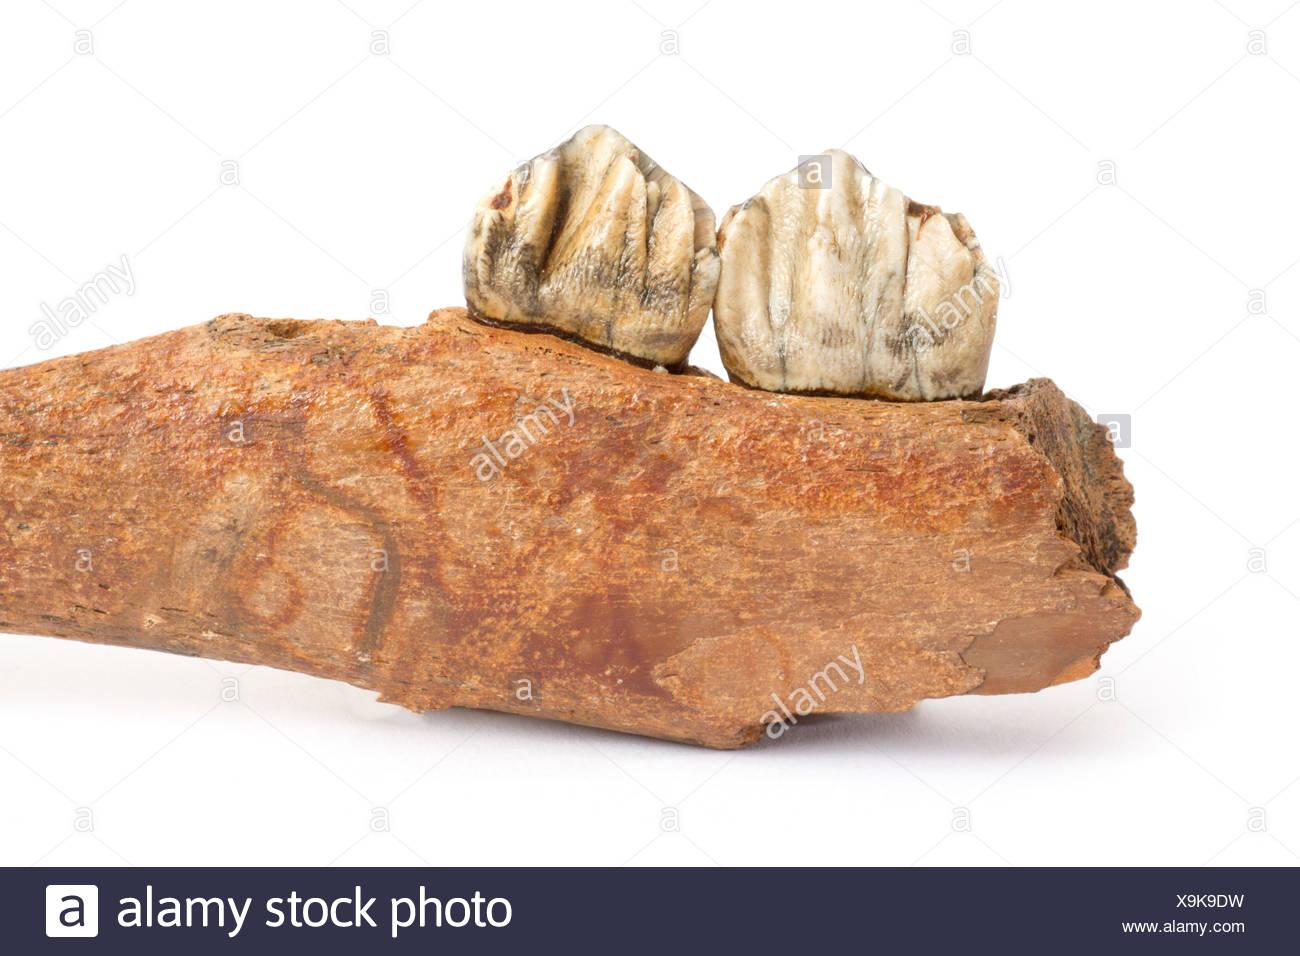 Pine, Jaw, gigantic deer, Megalocerus giganteus germanicus, Pleistocene, fossil, fossilization, primeval times, deer, stag, toot - Stock Image